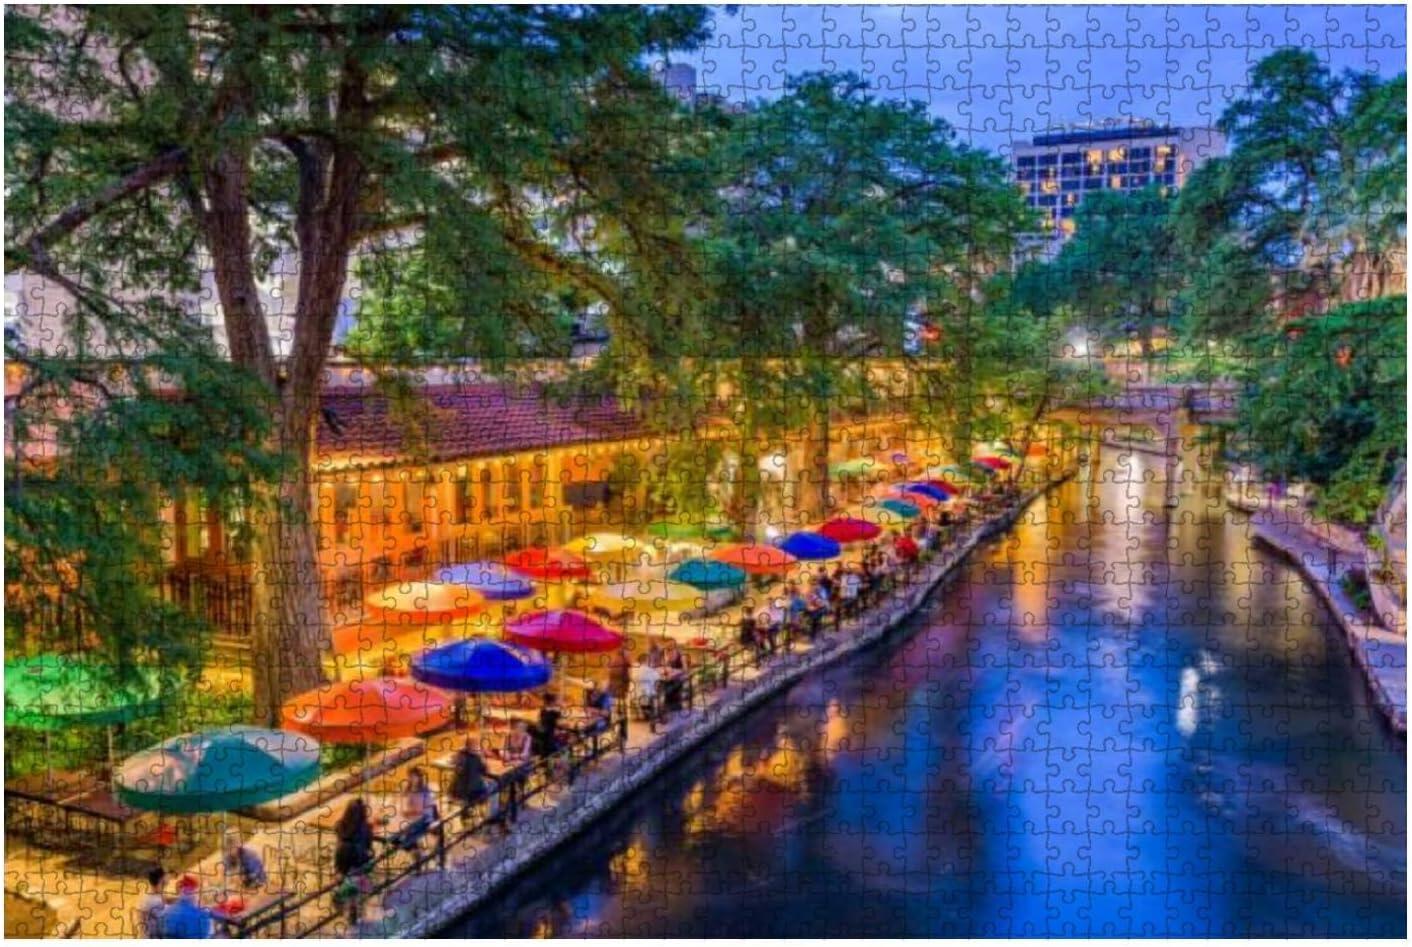 san Antonio Texas USA Water City Free Stock Ranking TOP7 Pictures Royalty Virginia Beach Mall